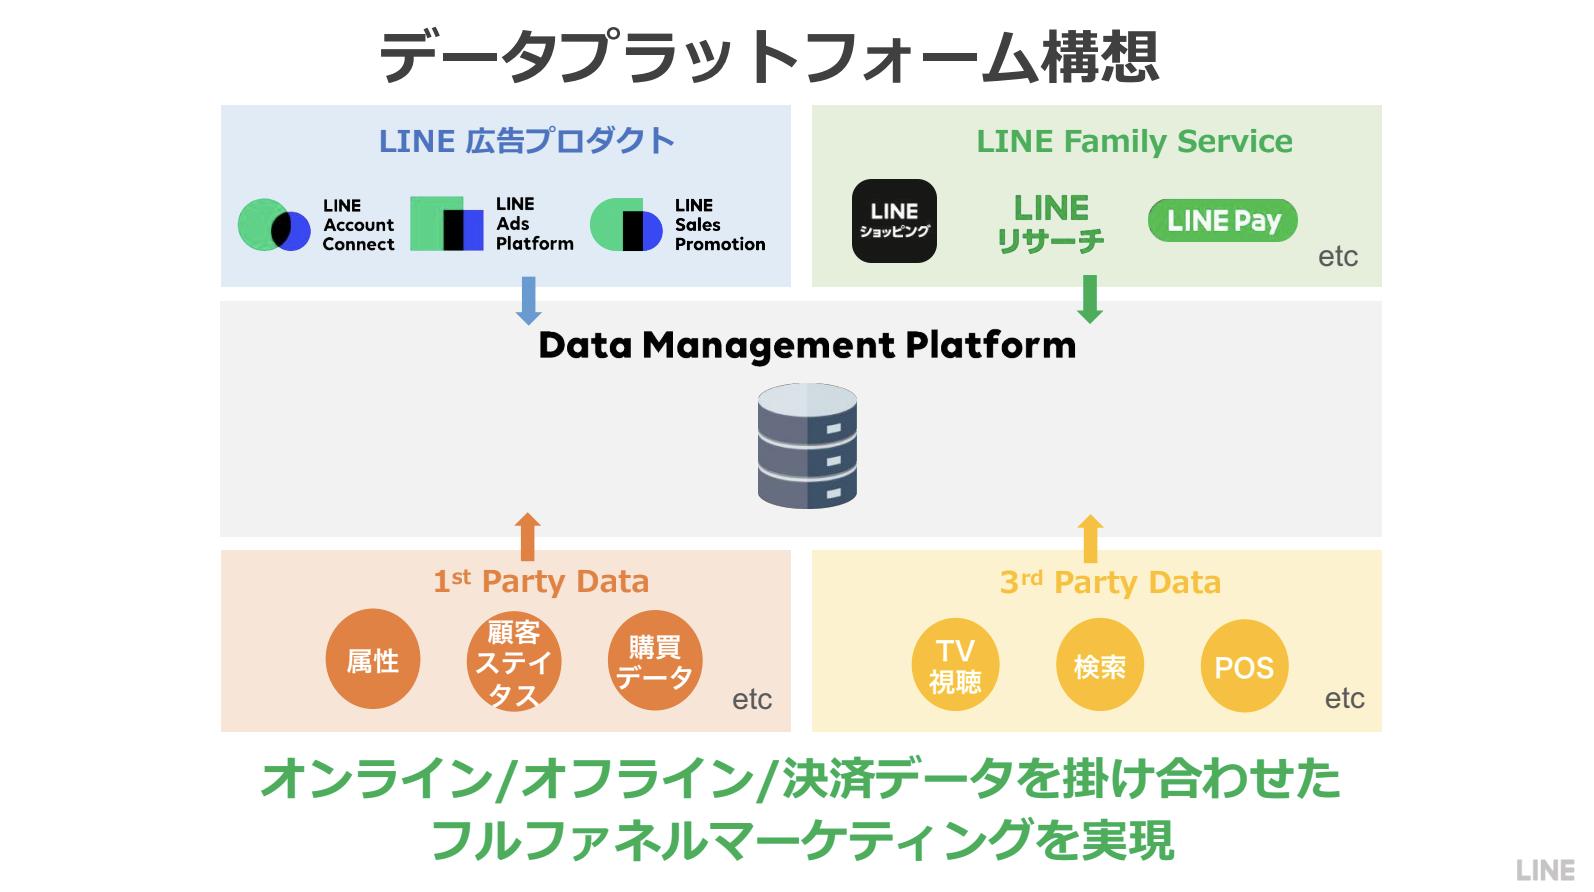 LINE-20190306-03.png